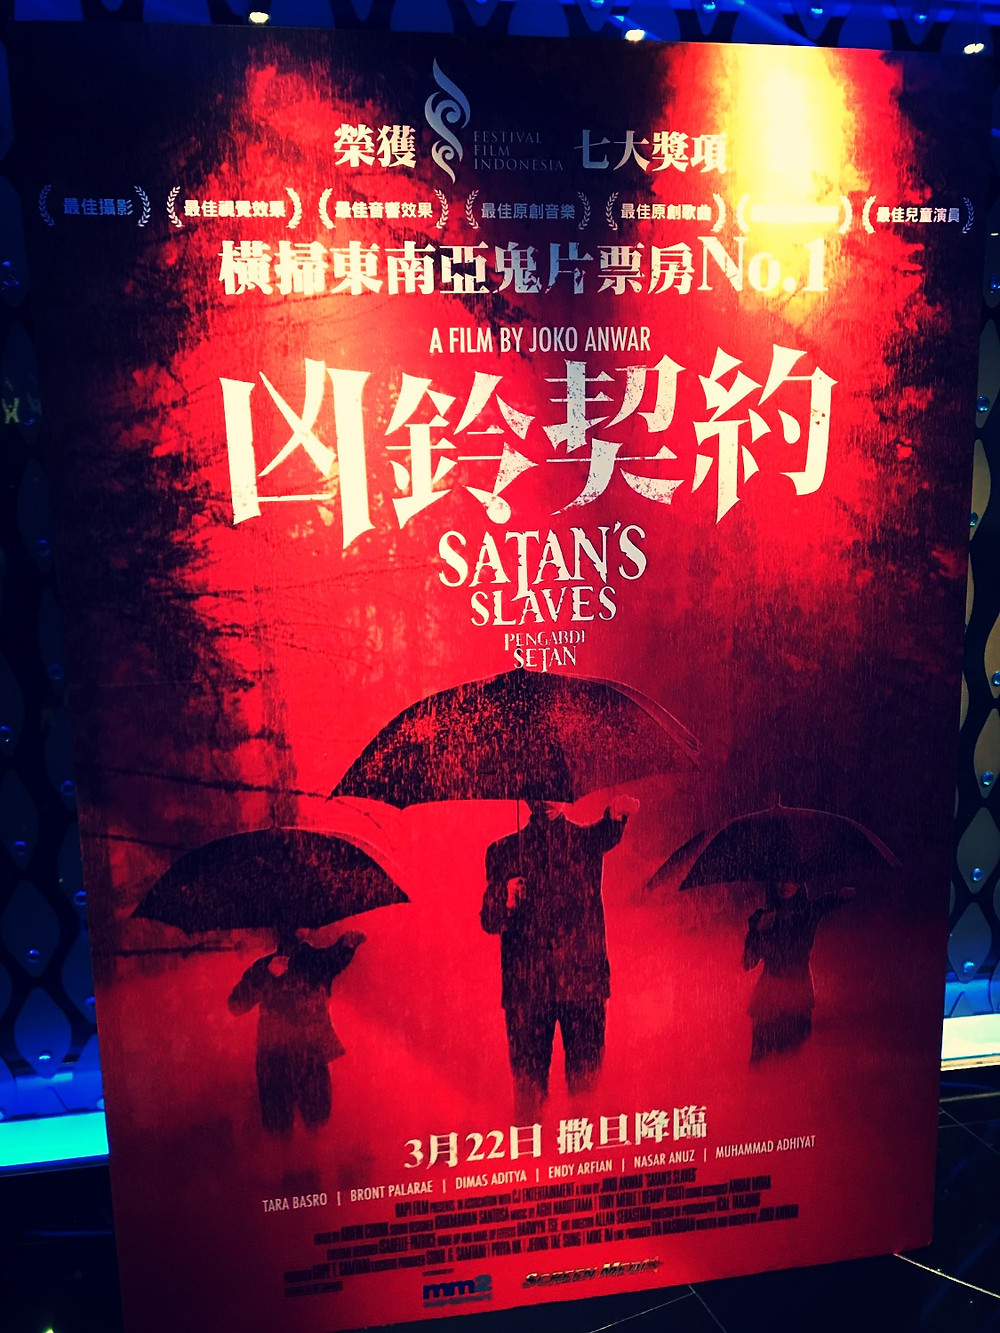 FILE PHOTO: A Screening of SATAN'S SLAVES (2018). ©Ryota Nakanishi